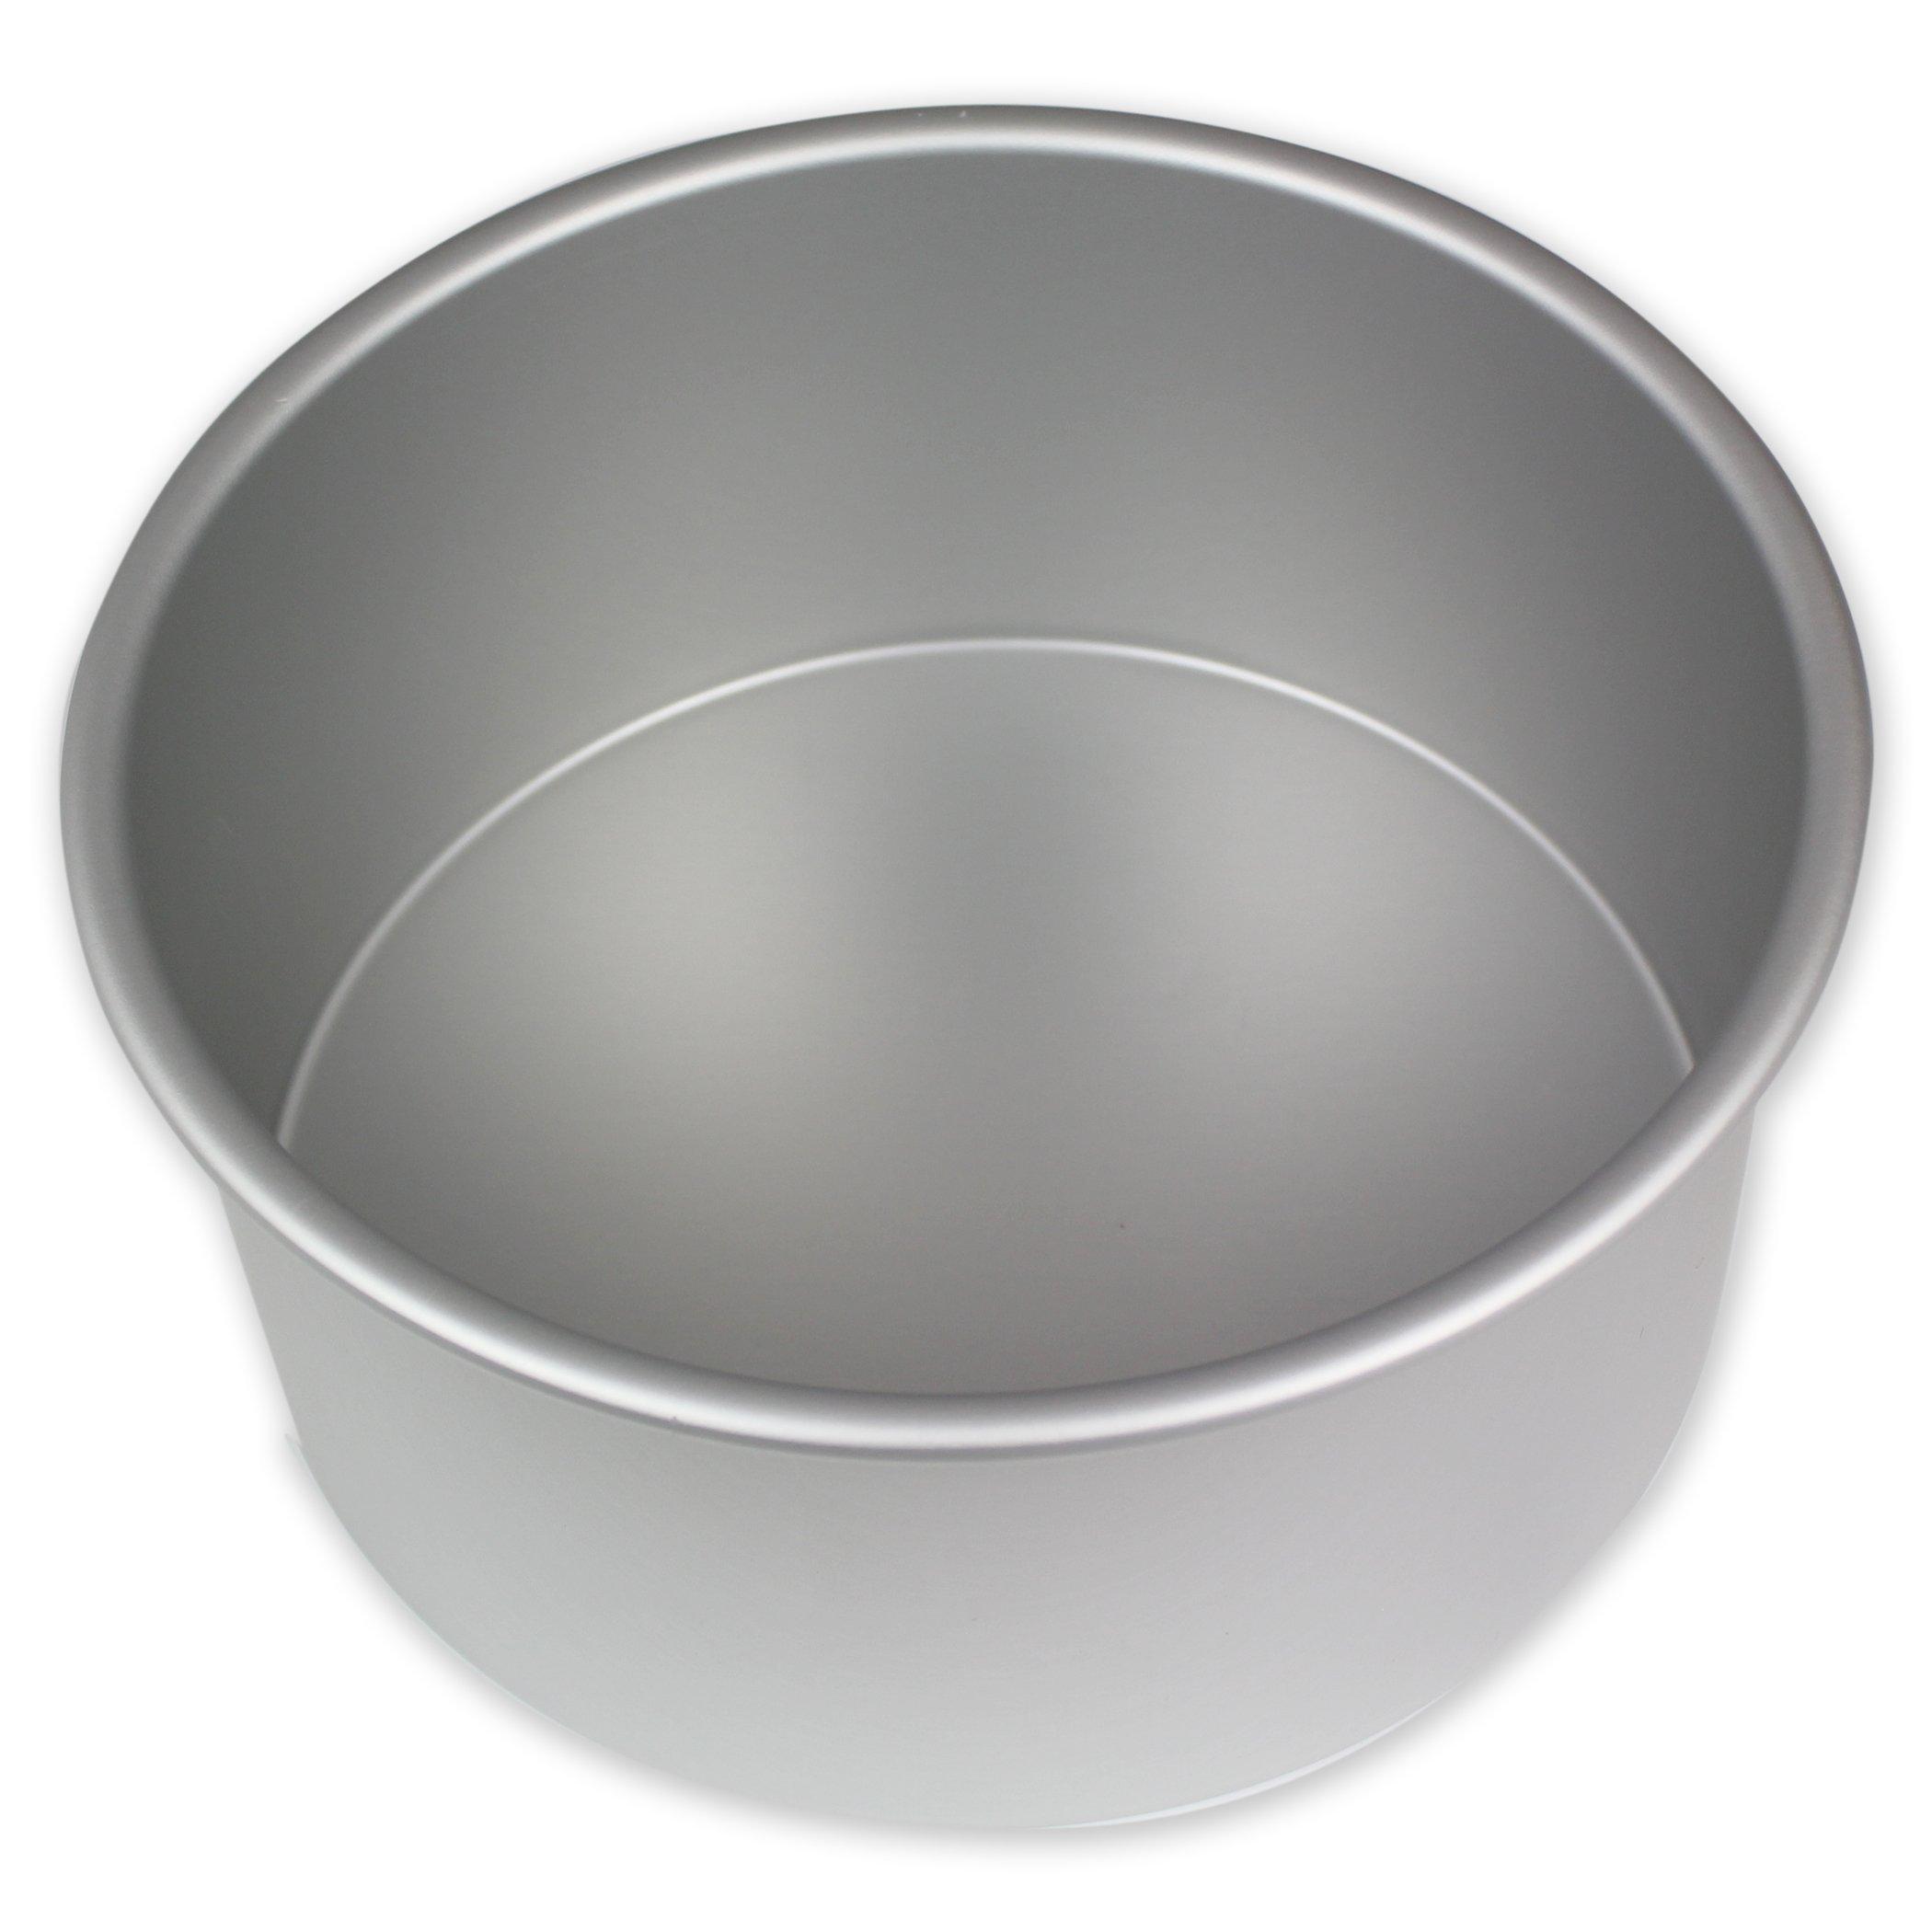 PME RND074 Round Seamless Professional Aluminum Baking Pan, 7'' x 4'', Silver